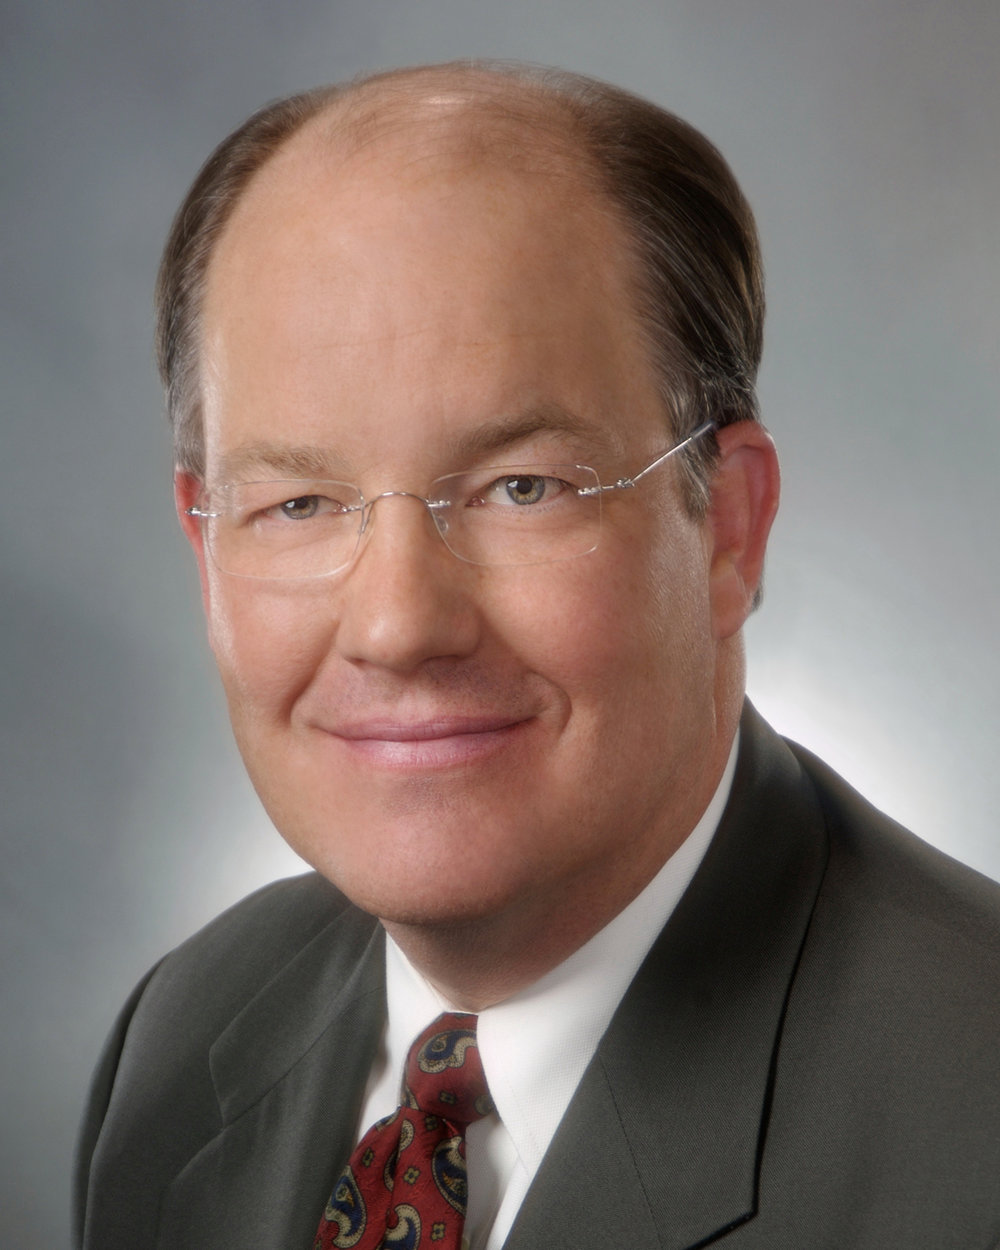 John Hoard